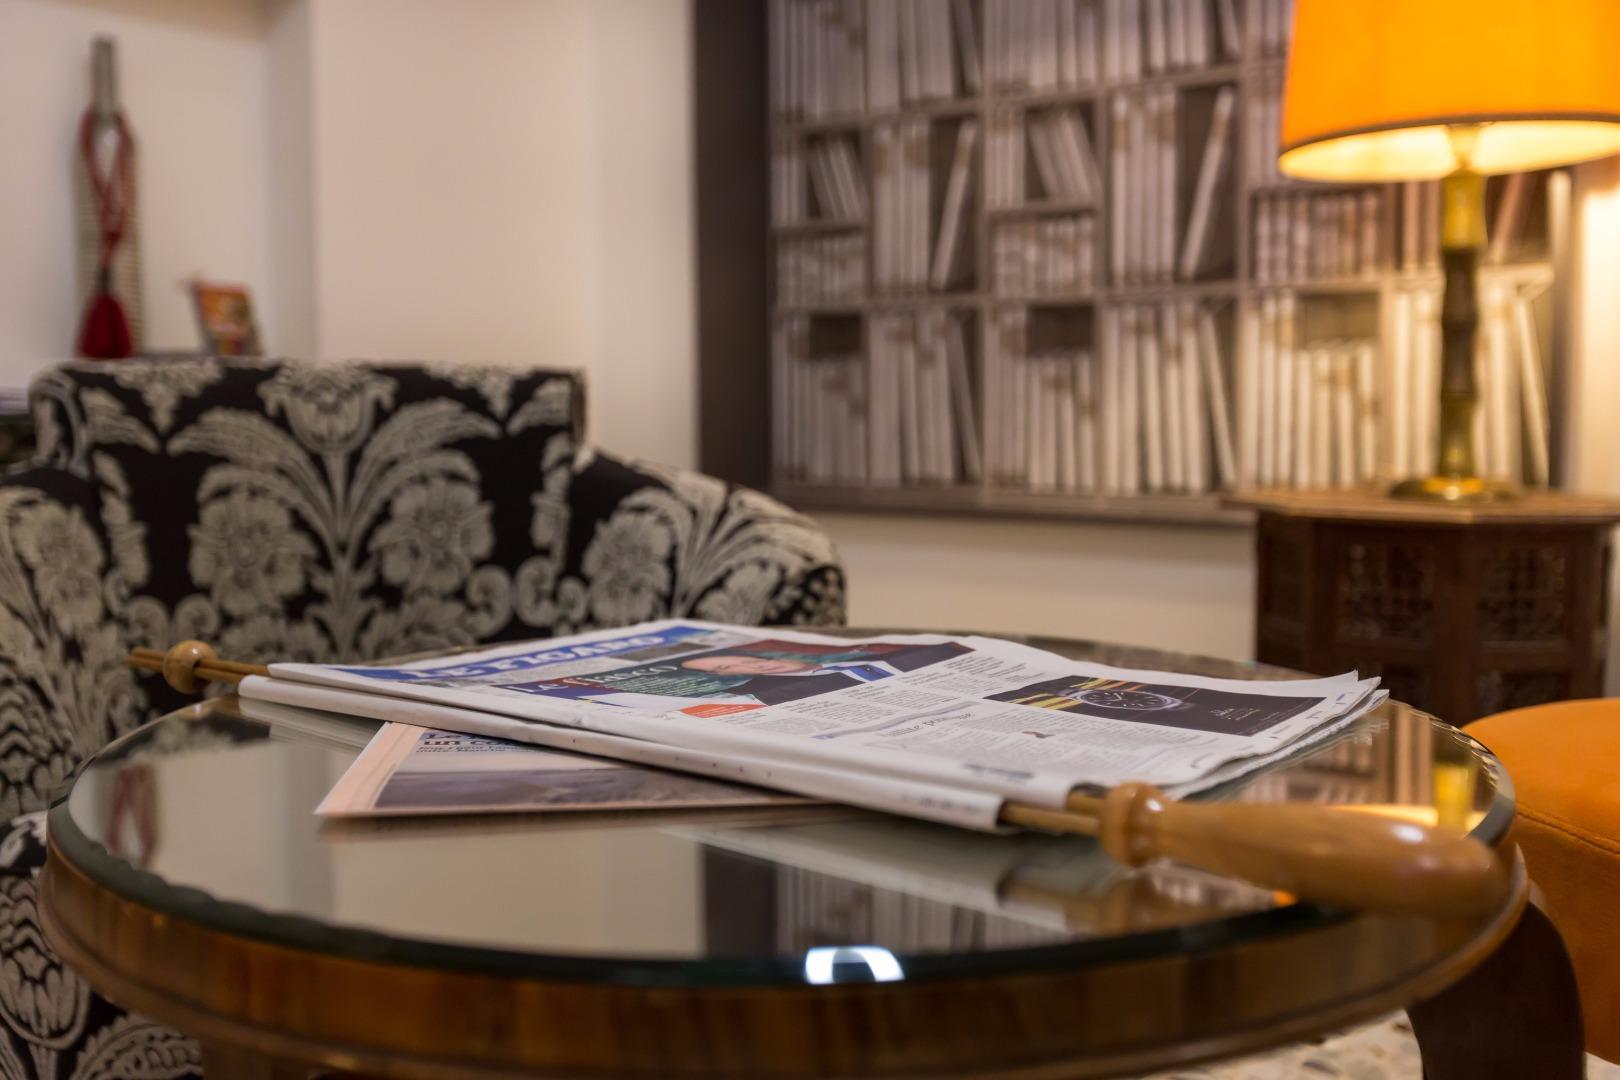 vos s minaires l 39 h tel raymond 4 toulouse centre. Black Bedroom Furniture Sets. Home Design Ideas